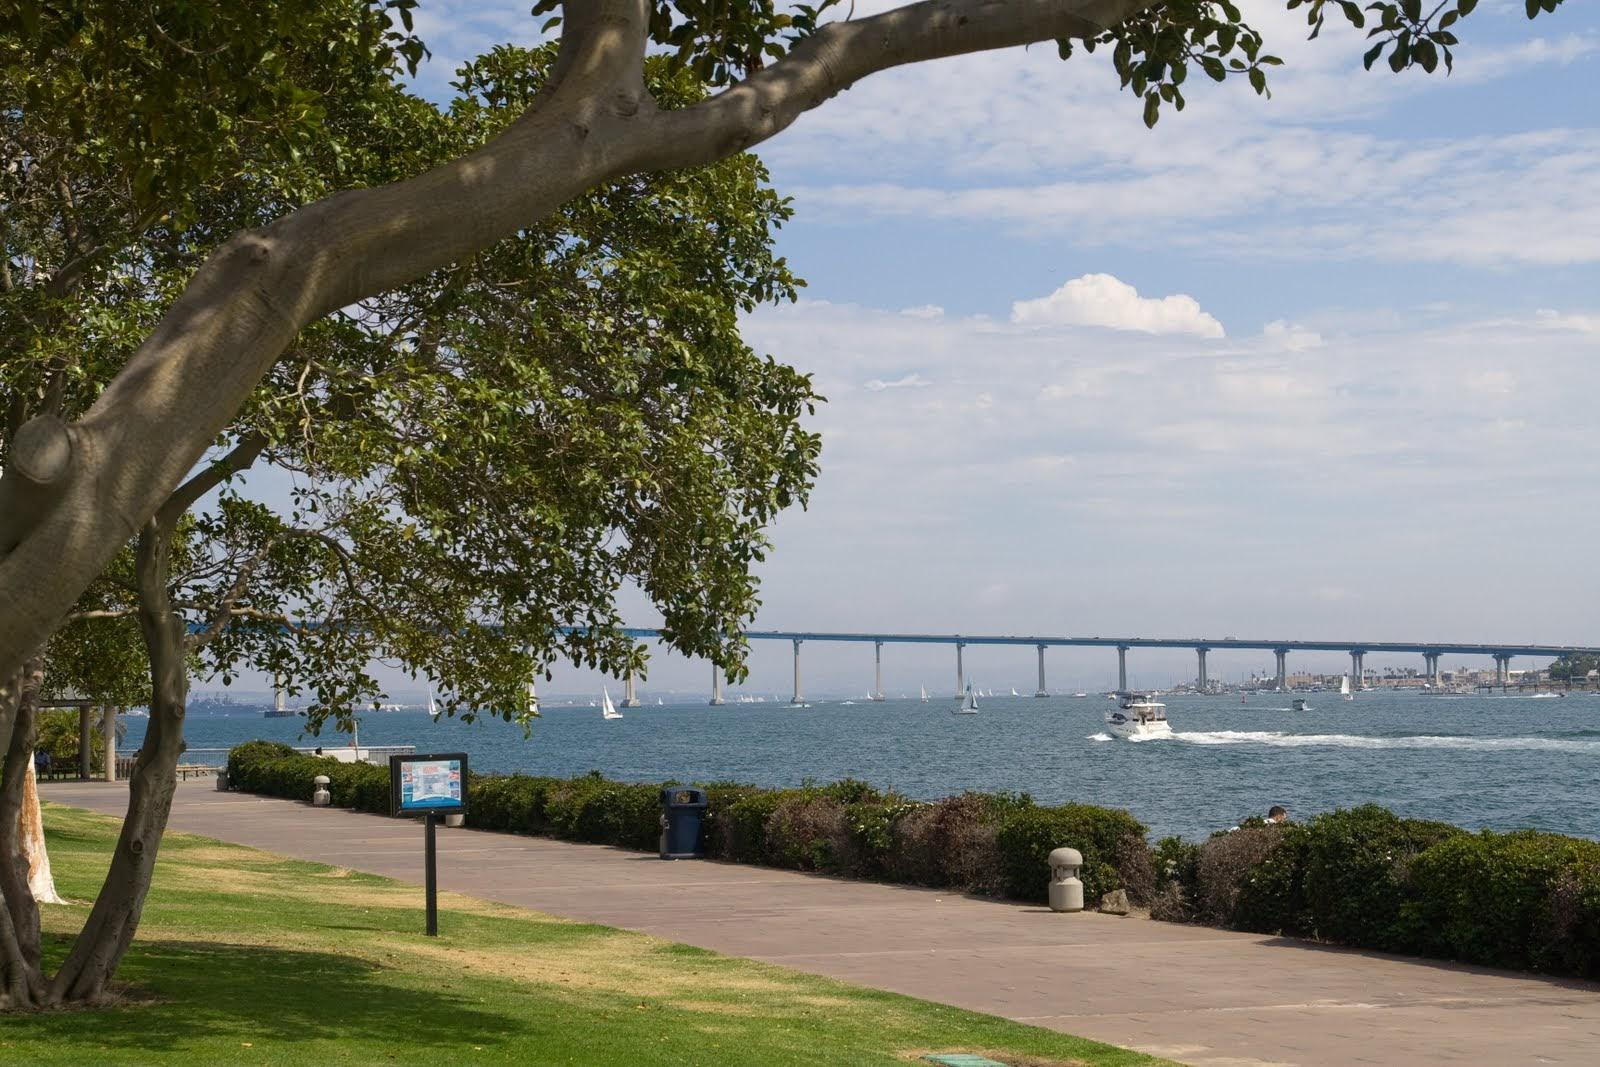 San Diego Marina Bay